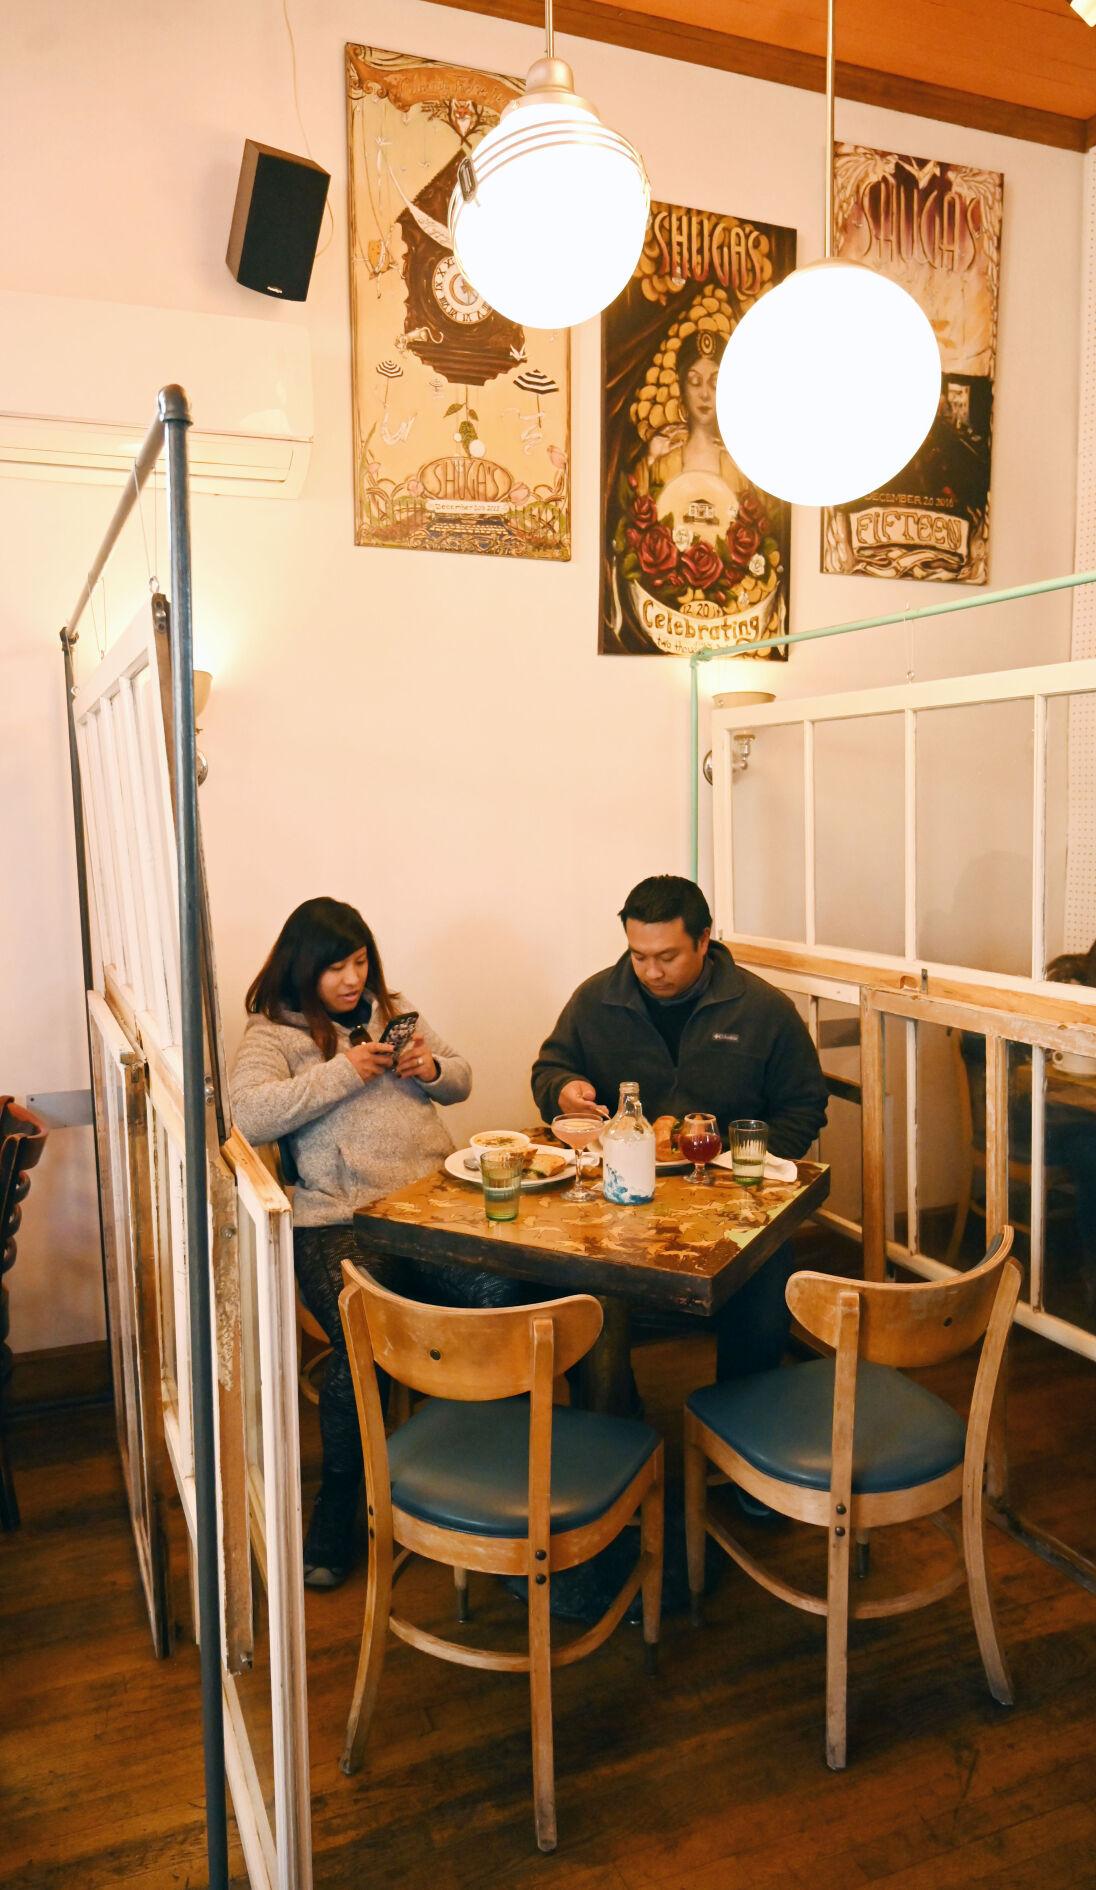 010521-news-restaurants 02.JPG